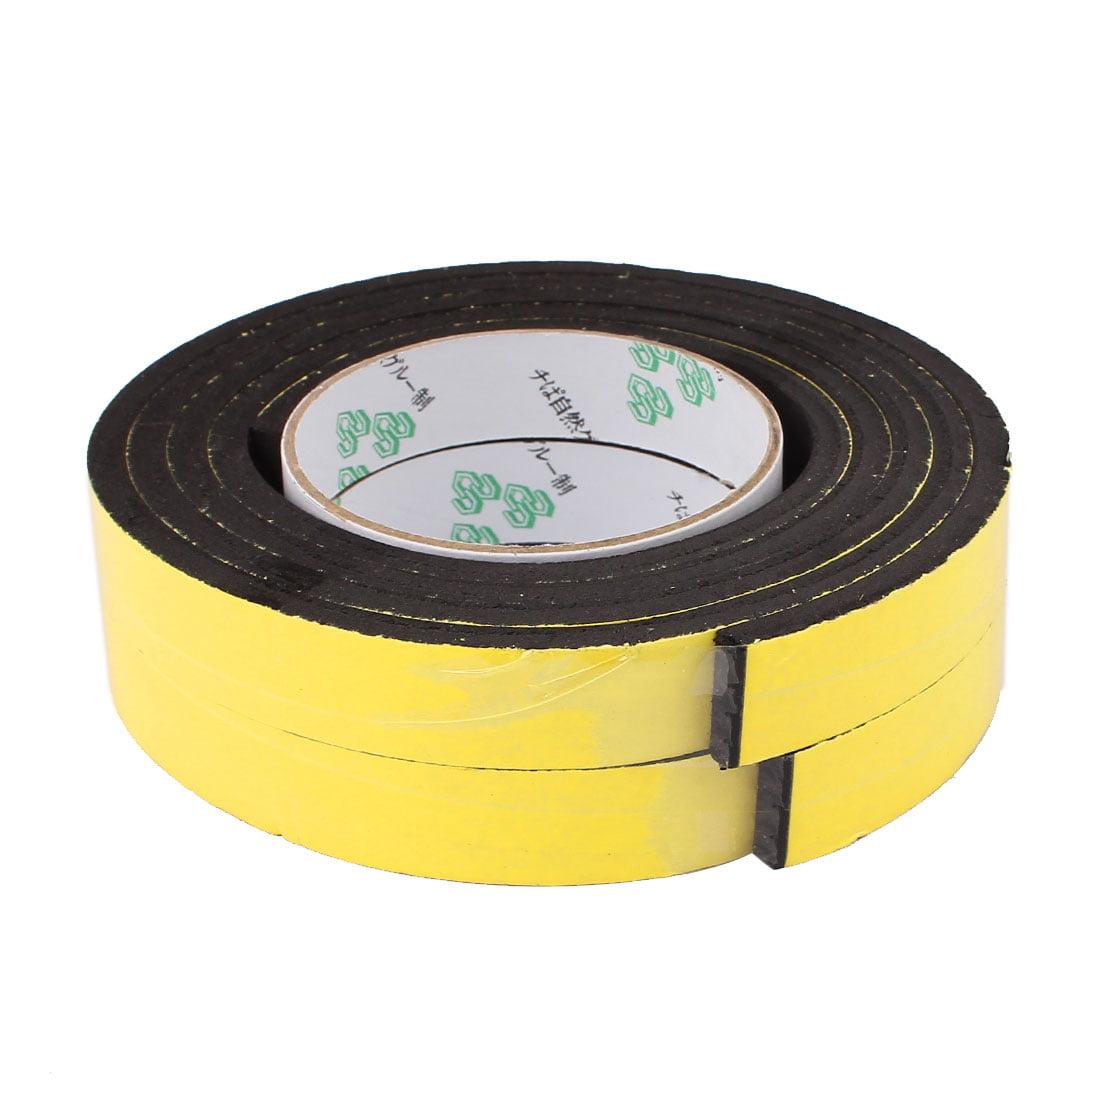 2 Pcs 20 x 6mm Single Sided Self Adhesive Shockproof Sponge Foam Tape 2M Length